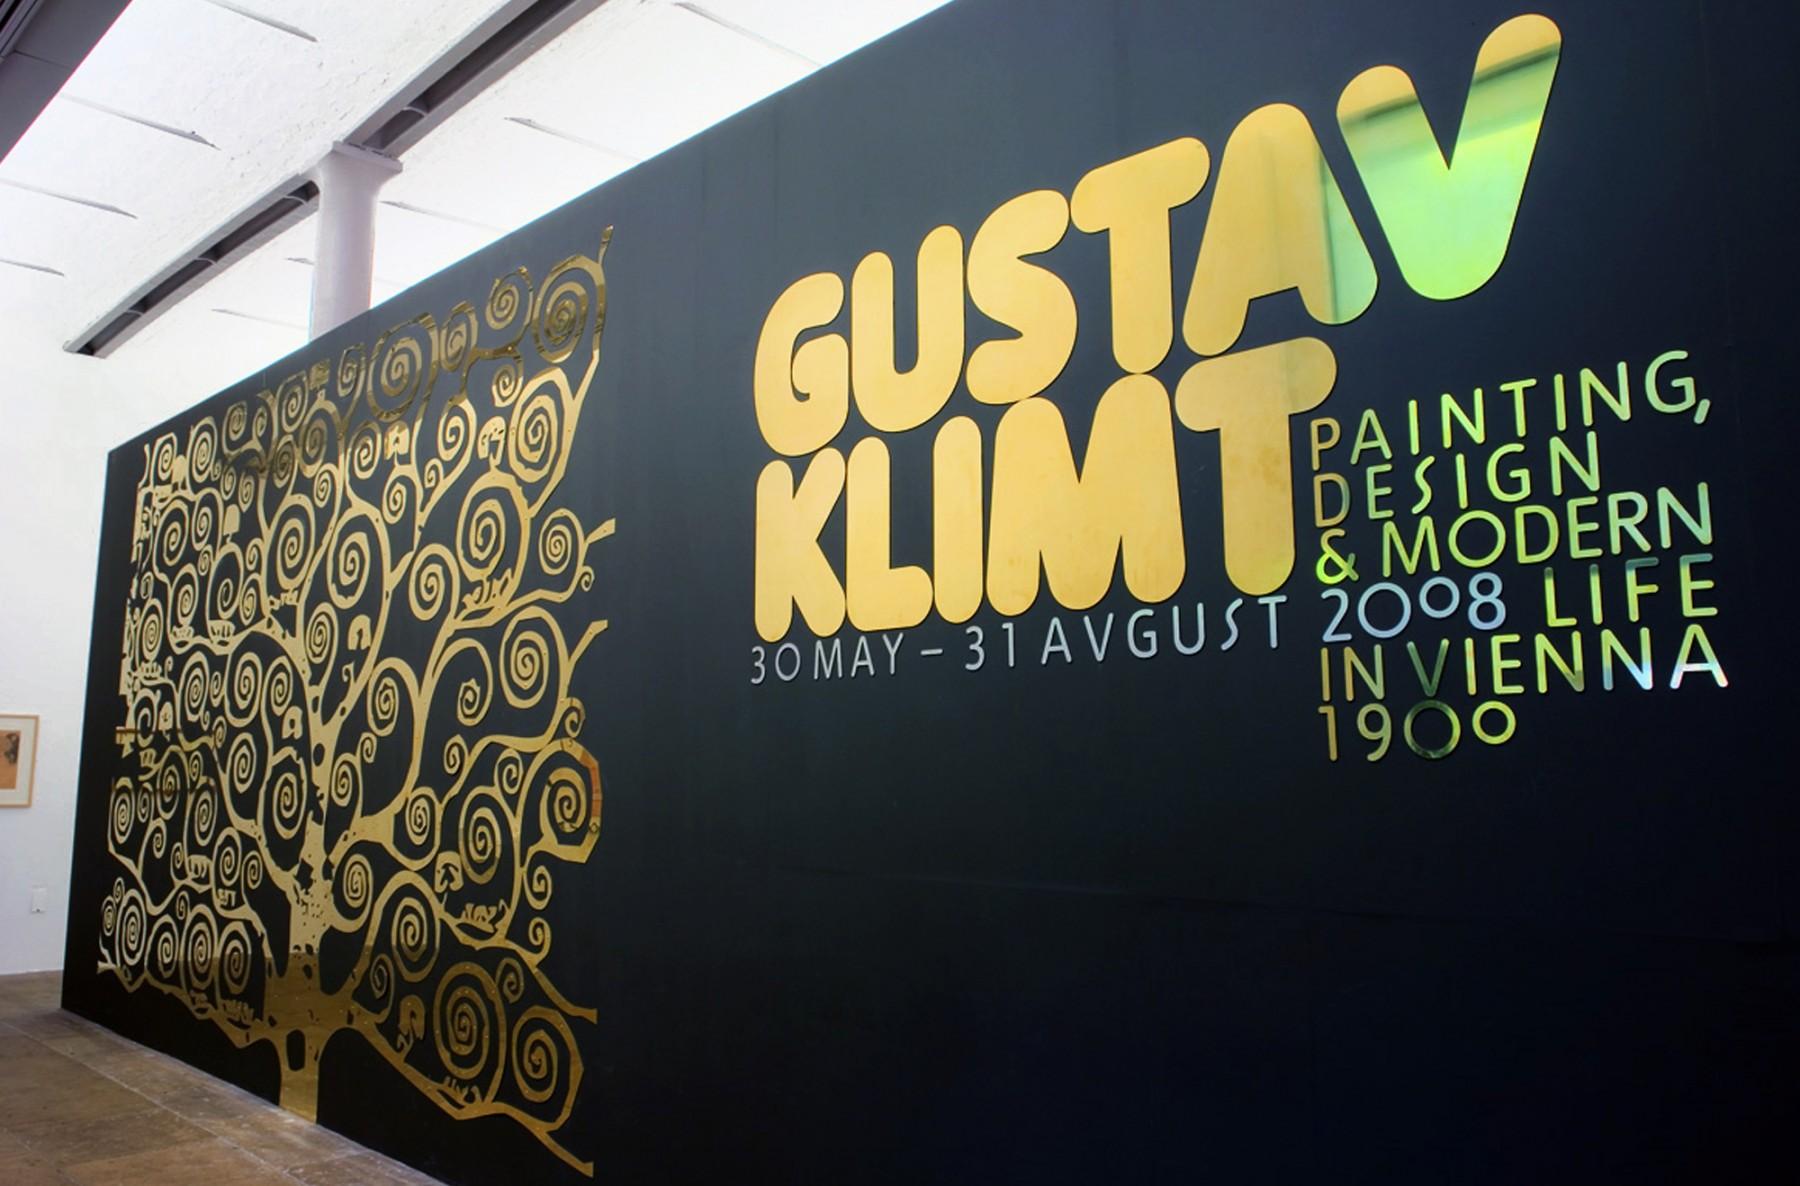 Gustav-Klimt-Painting-Design-Modern-Life-Vienna-Secession-Tate-Liverpool-art-exhibition-gallery-Jamie-Fobert-Architects-2